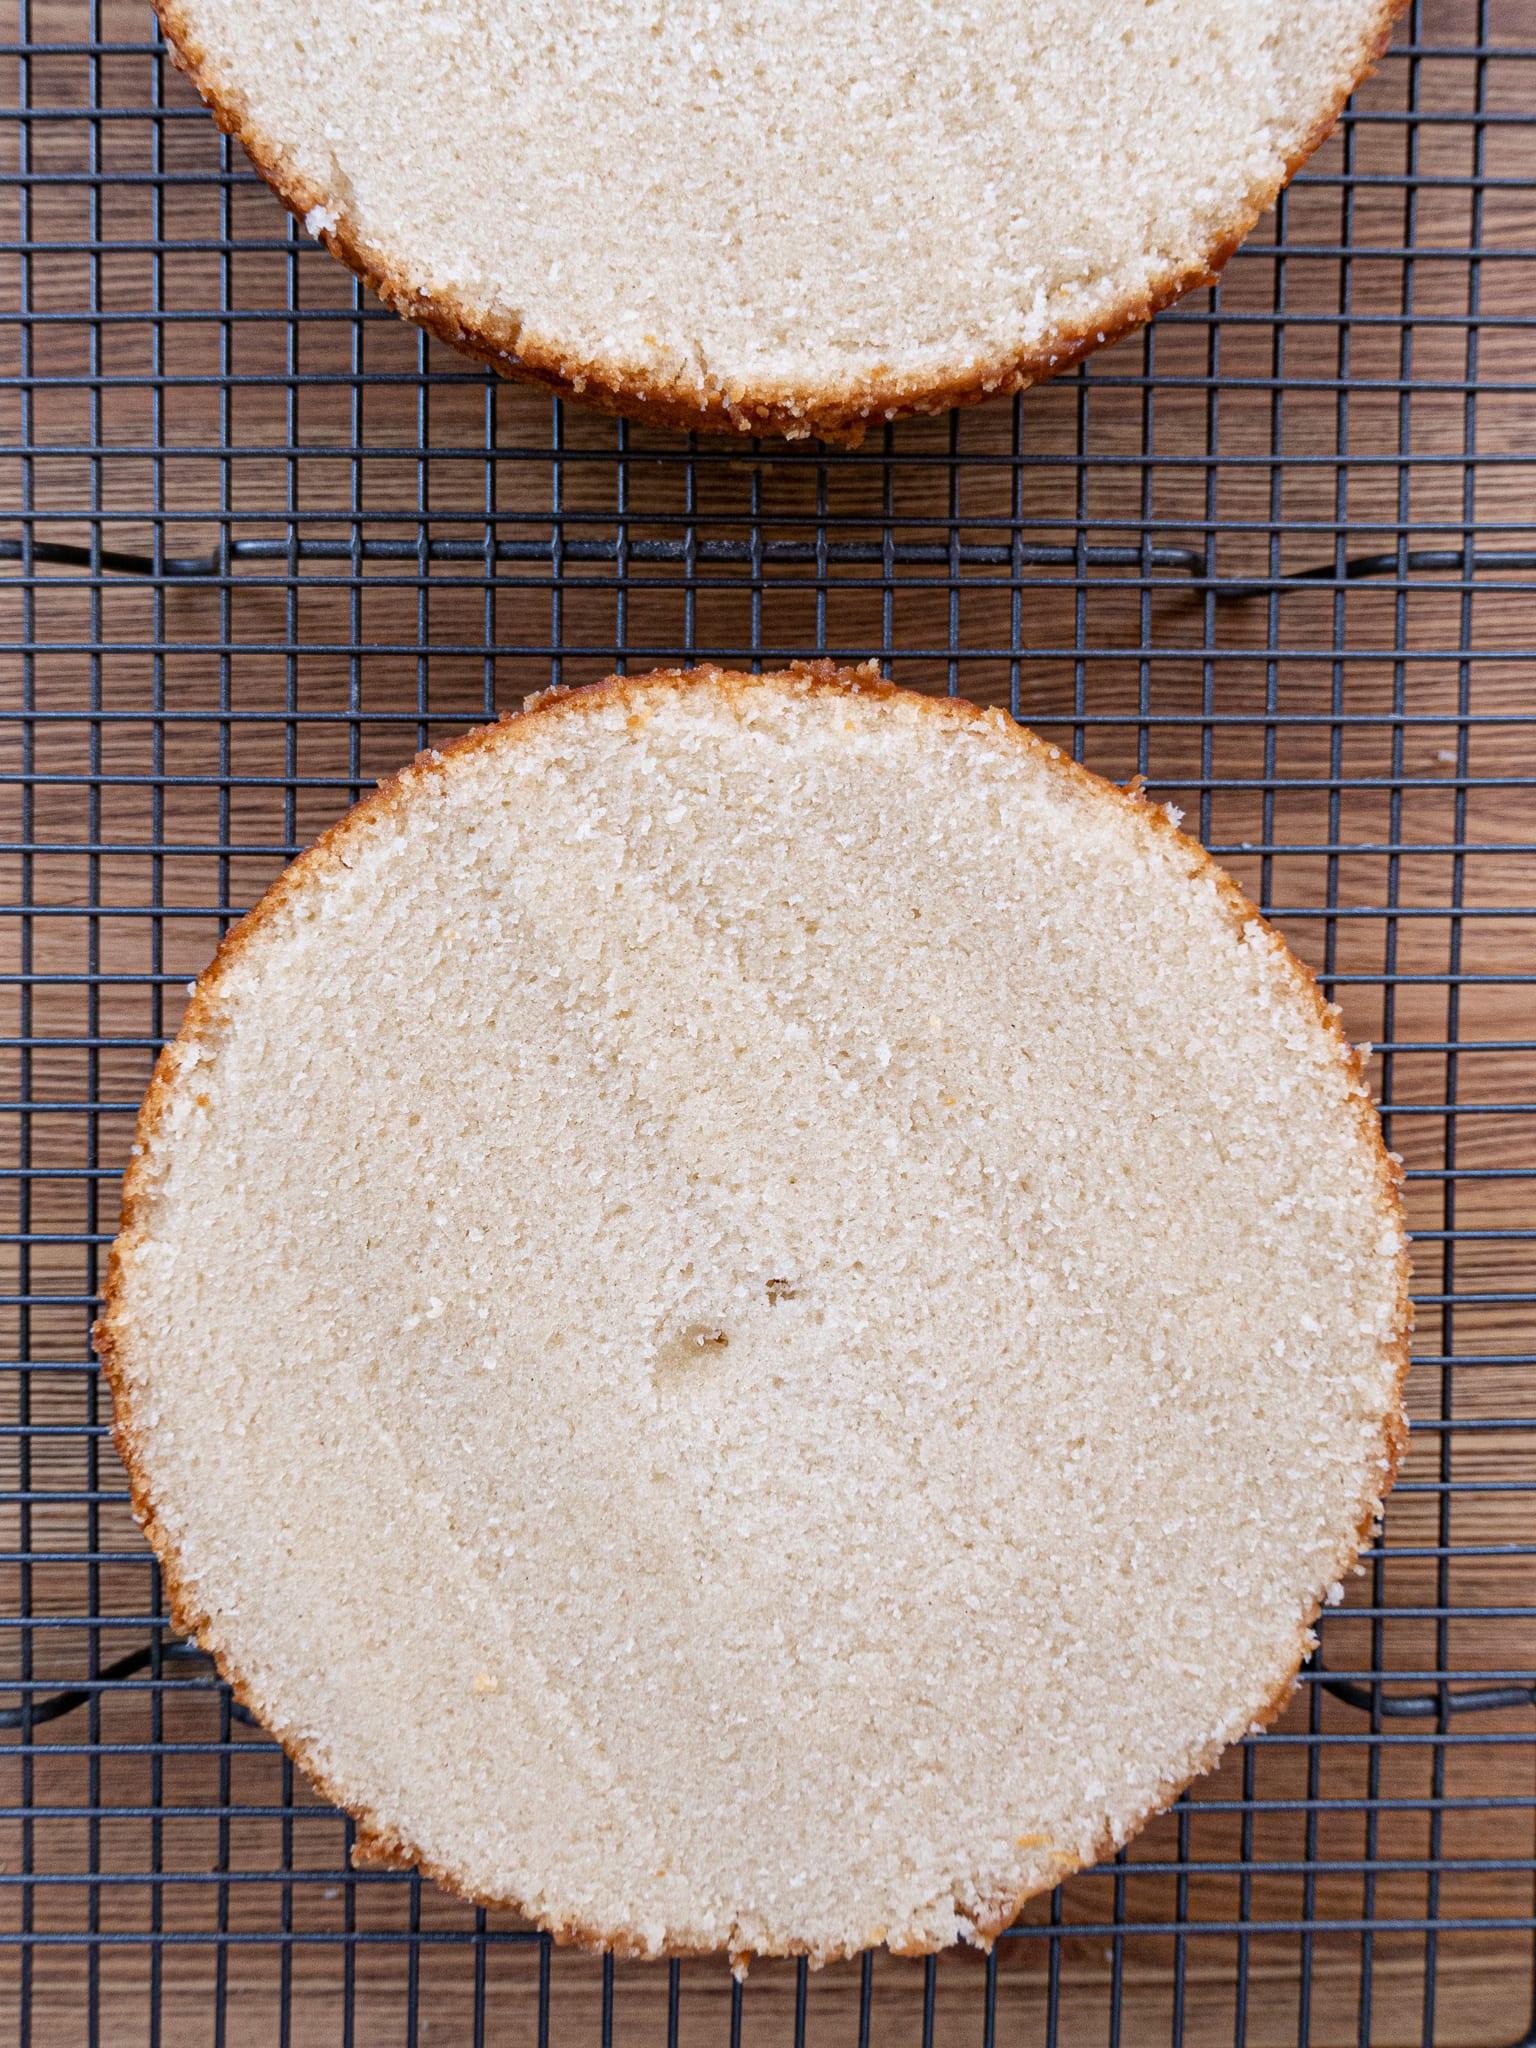 VEGAN SPONGE CAKE LAYER